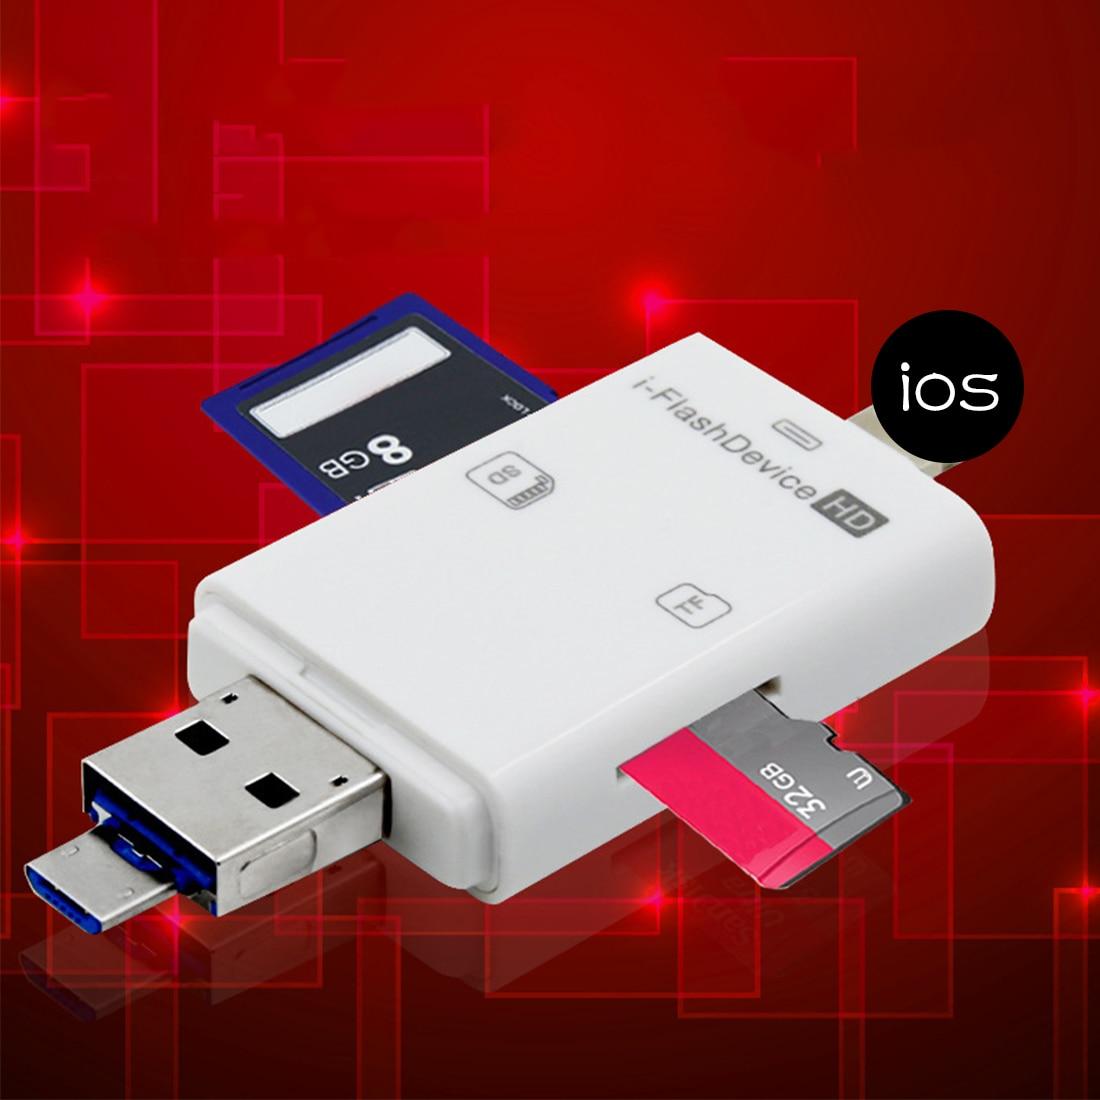 NOYOKERE 3in1 Micro USB Lettore di Micro SD SDHC TF SD Card Per iPhone 5/5 s/6/6 7 plus/ipad pro air/Samsung/LG/HTC Andrid OTG telefoni